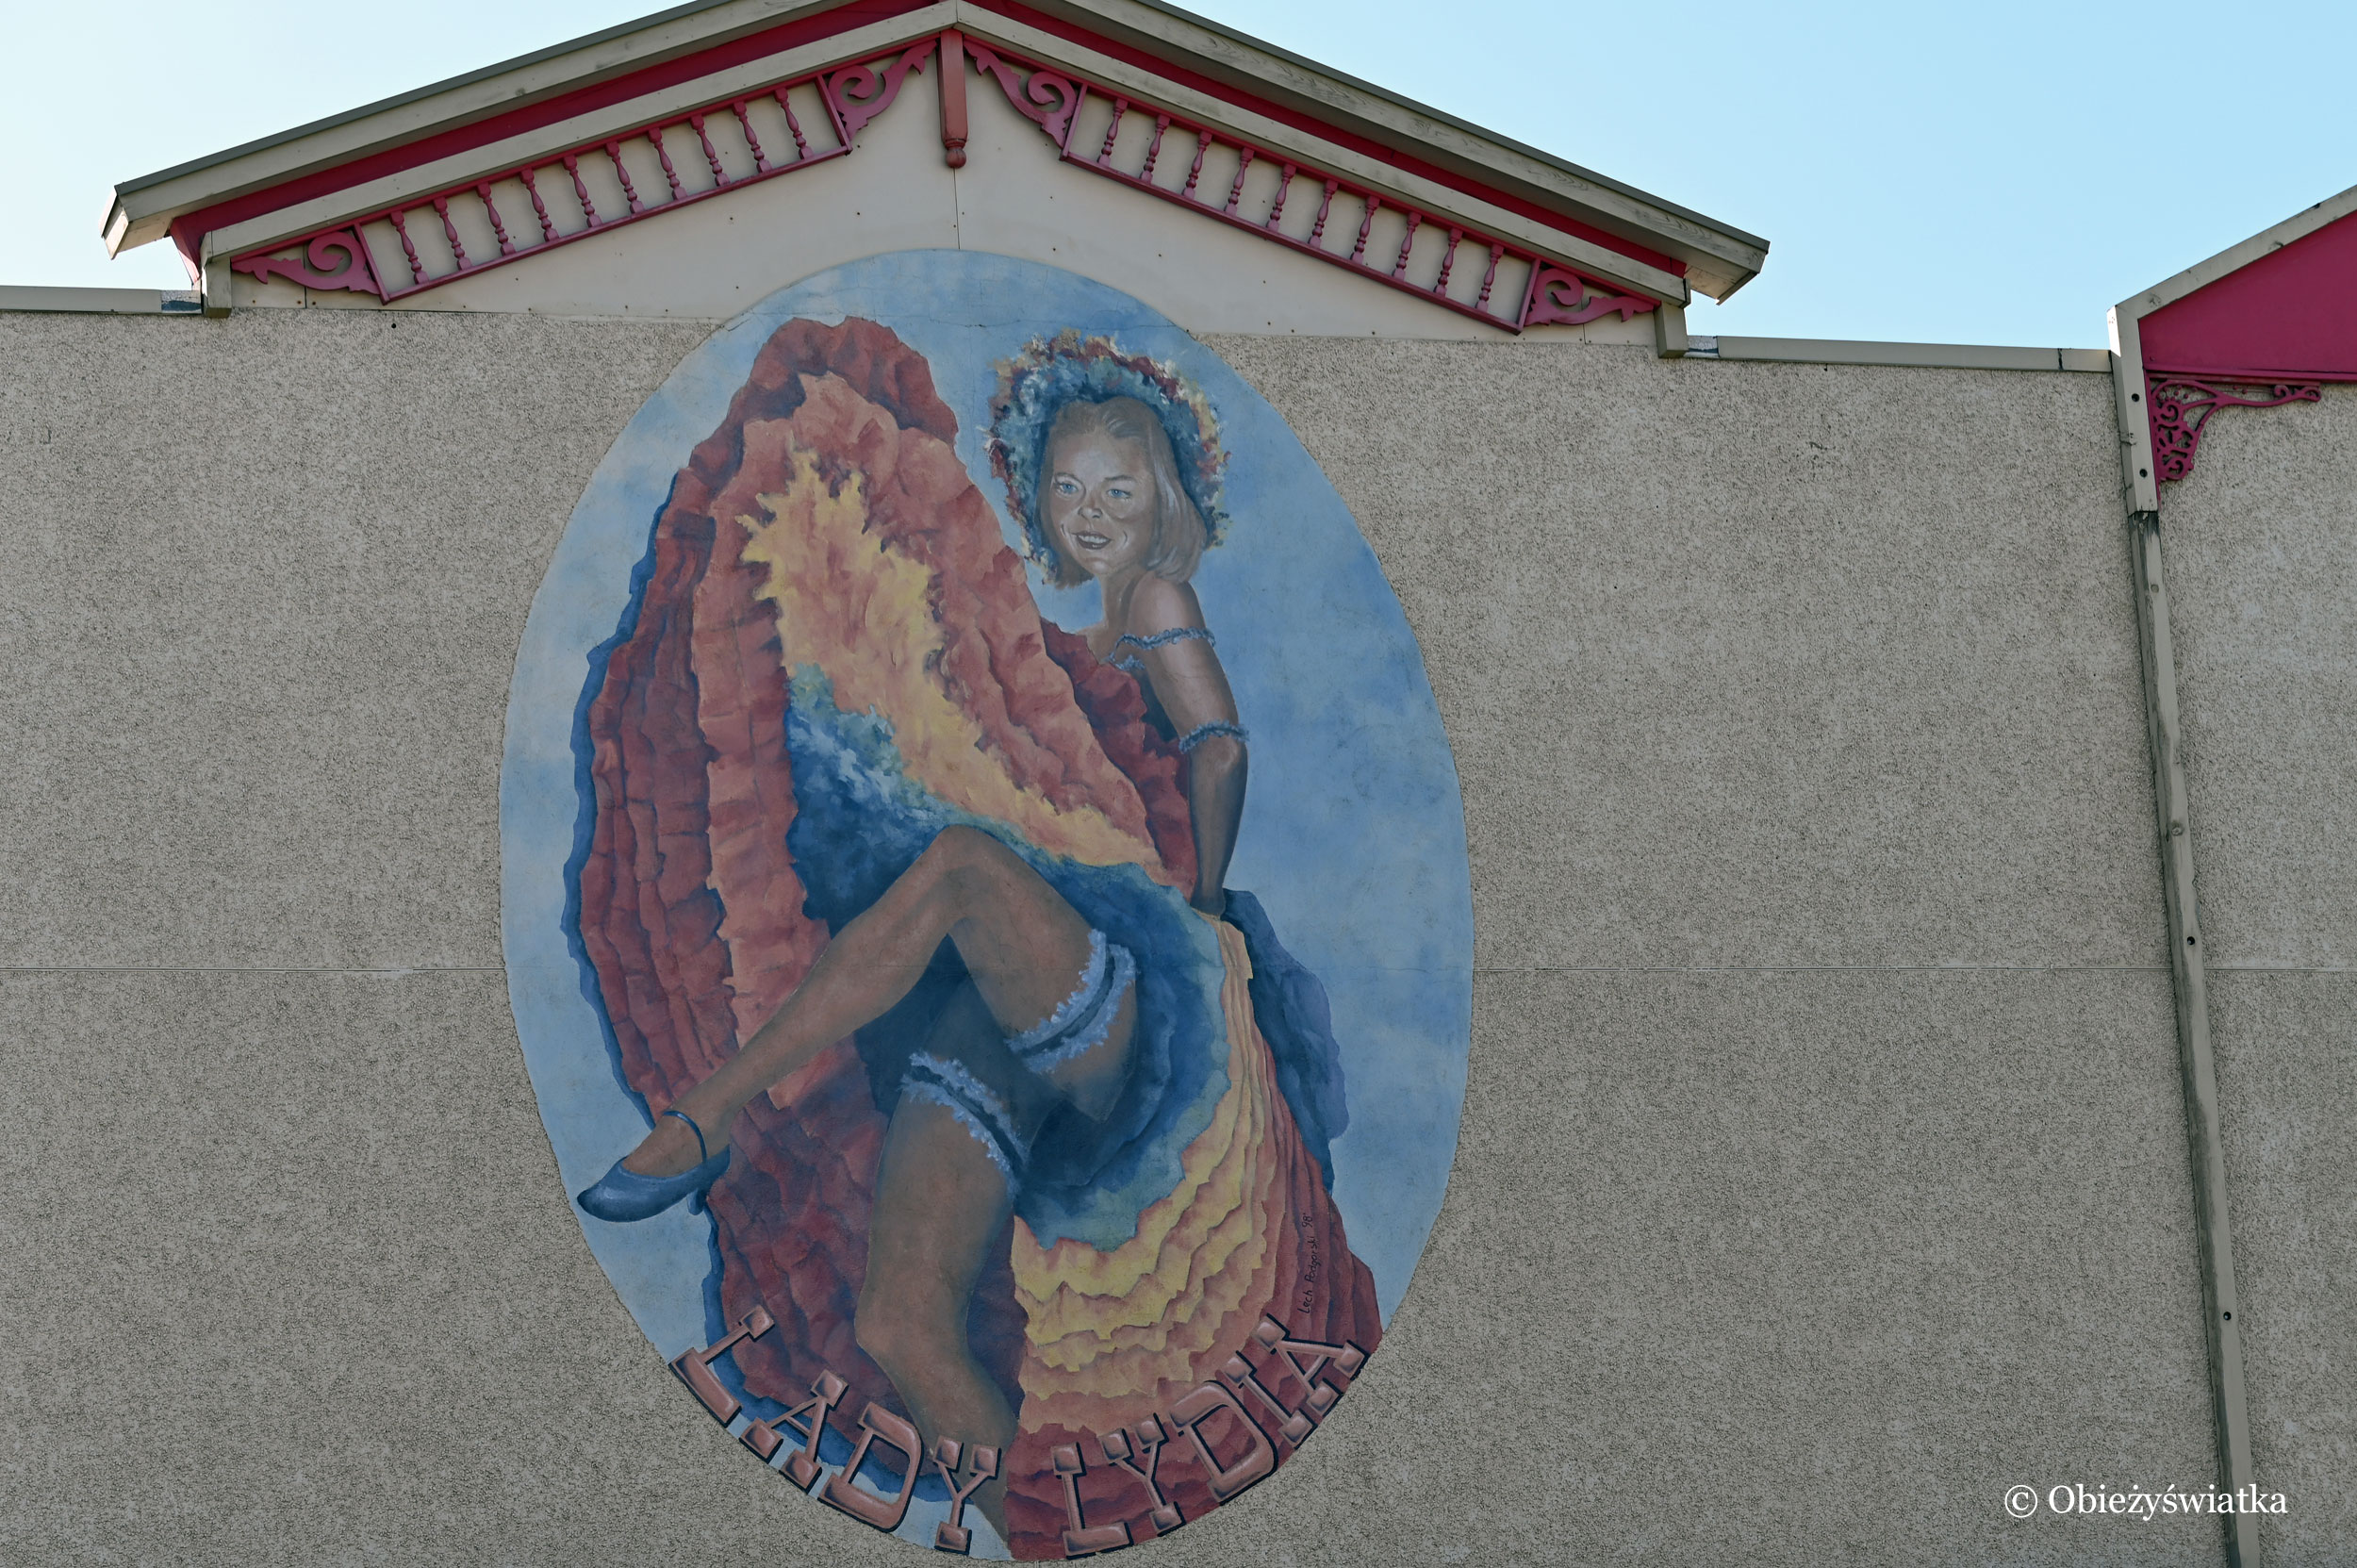 Jeden z murali w Whitehorse, Kanada